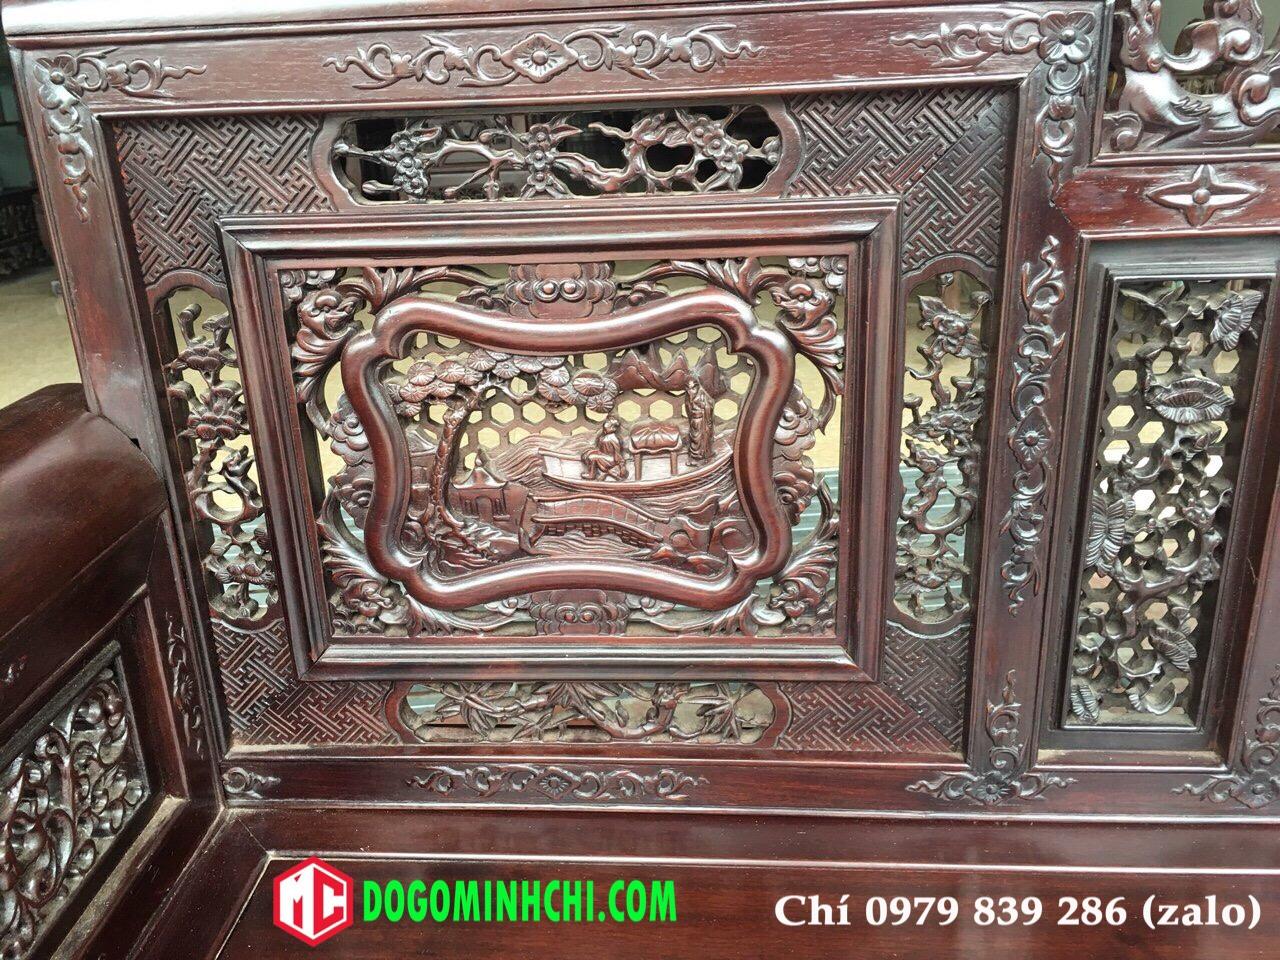 Bo-Truong-Ky-Tam-Son-Cham-Tich-Vai-Cuon-5